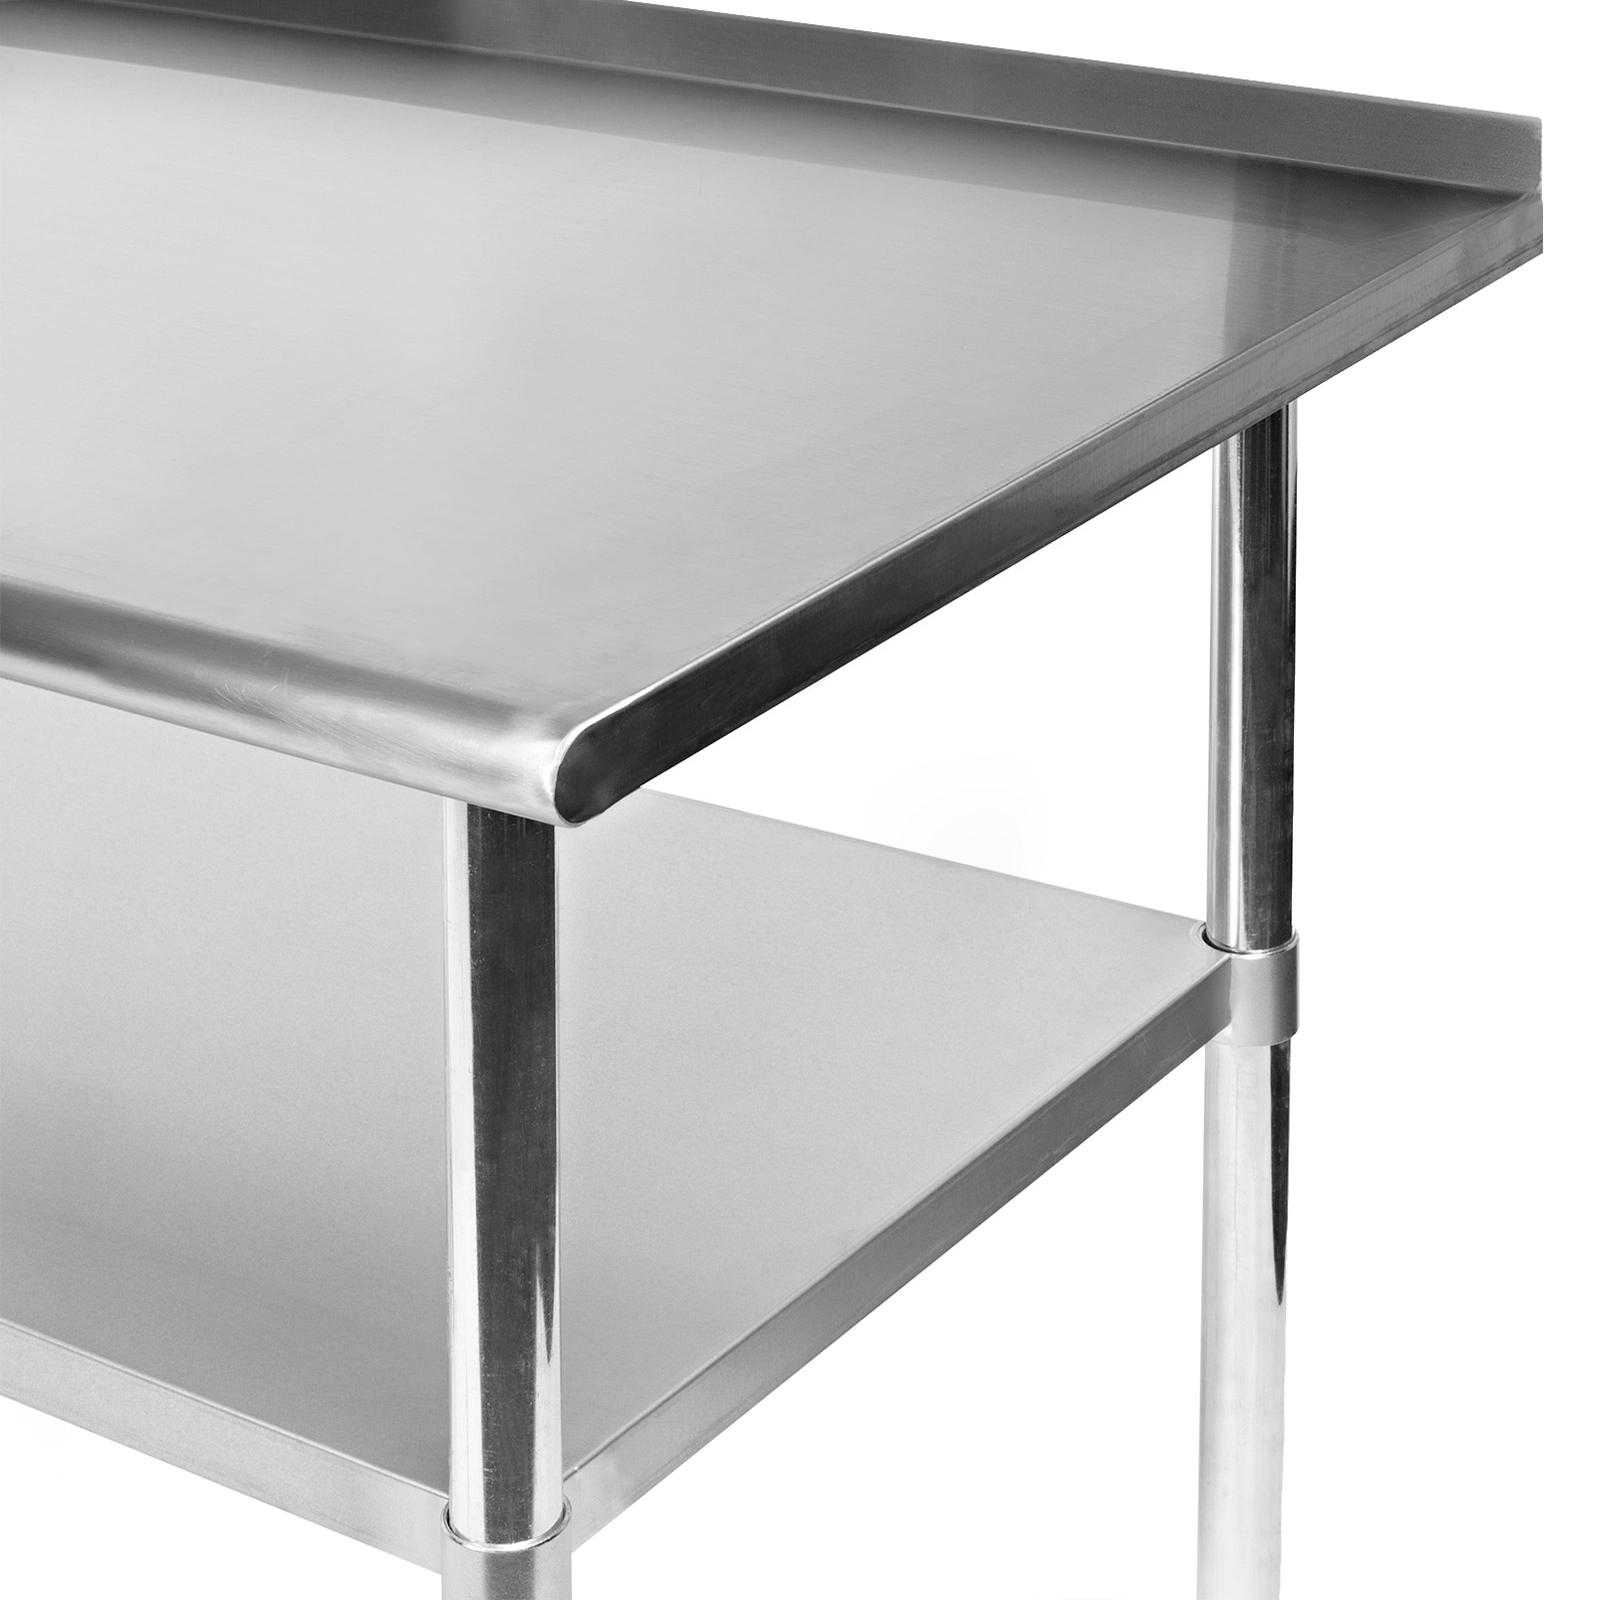 stainless kitchen restaurant prep table w backsplash and 4 casters 30 x 72 ebay. Black Bedroom Furniture Sets. Home Design Ideas